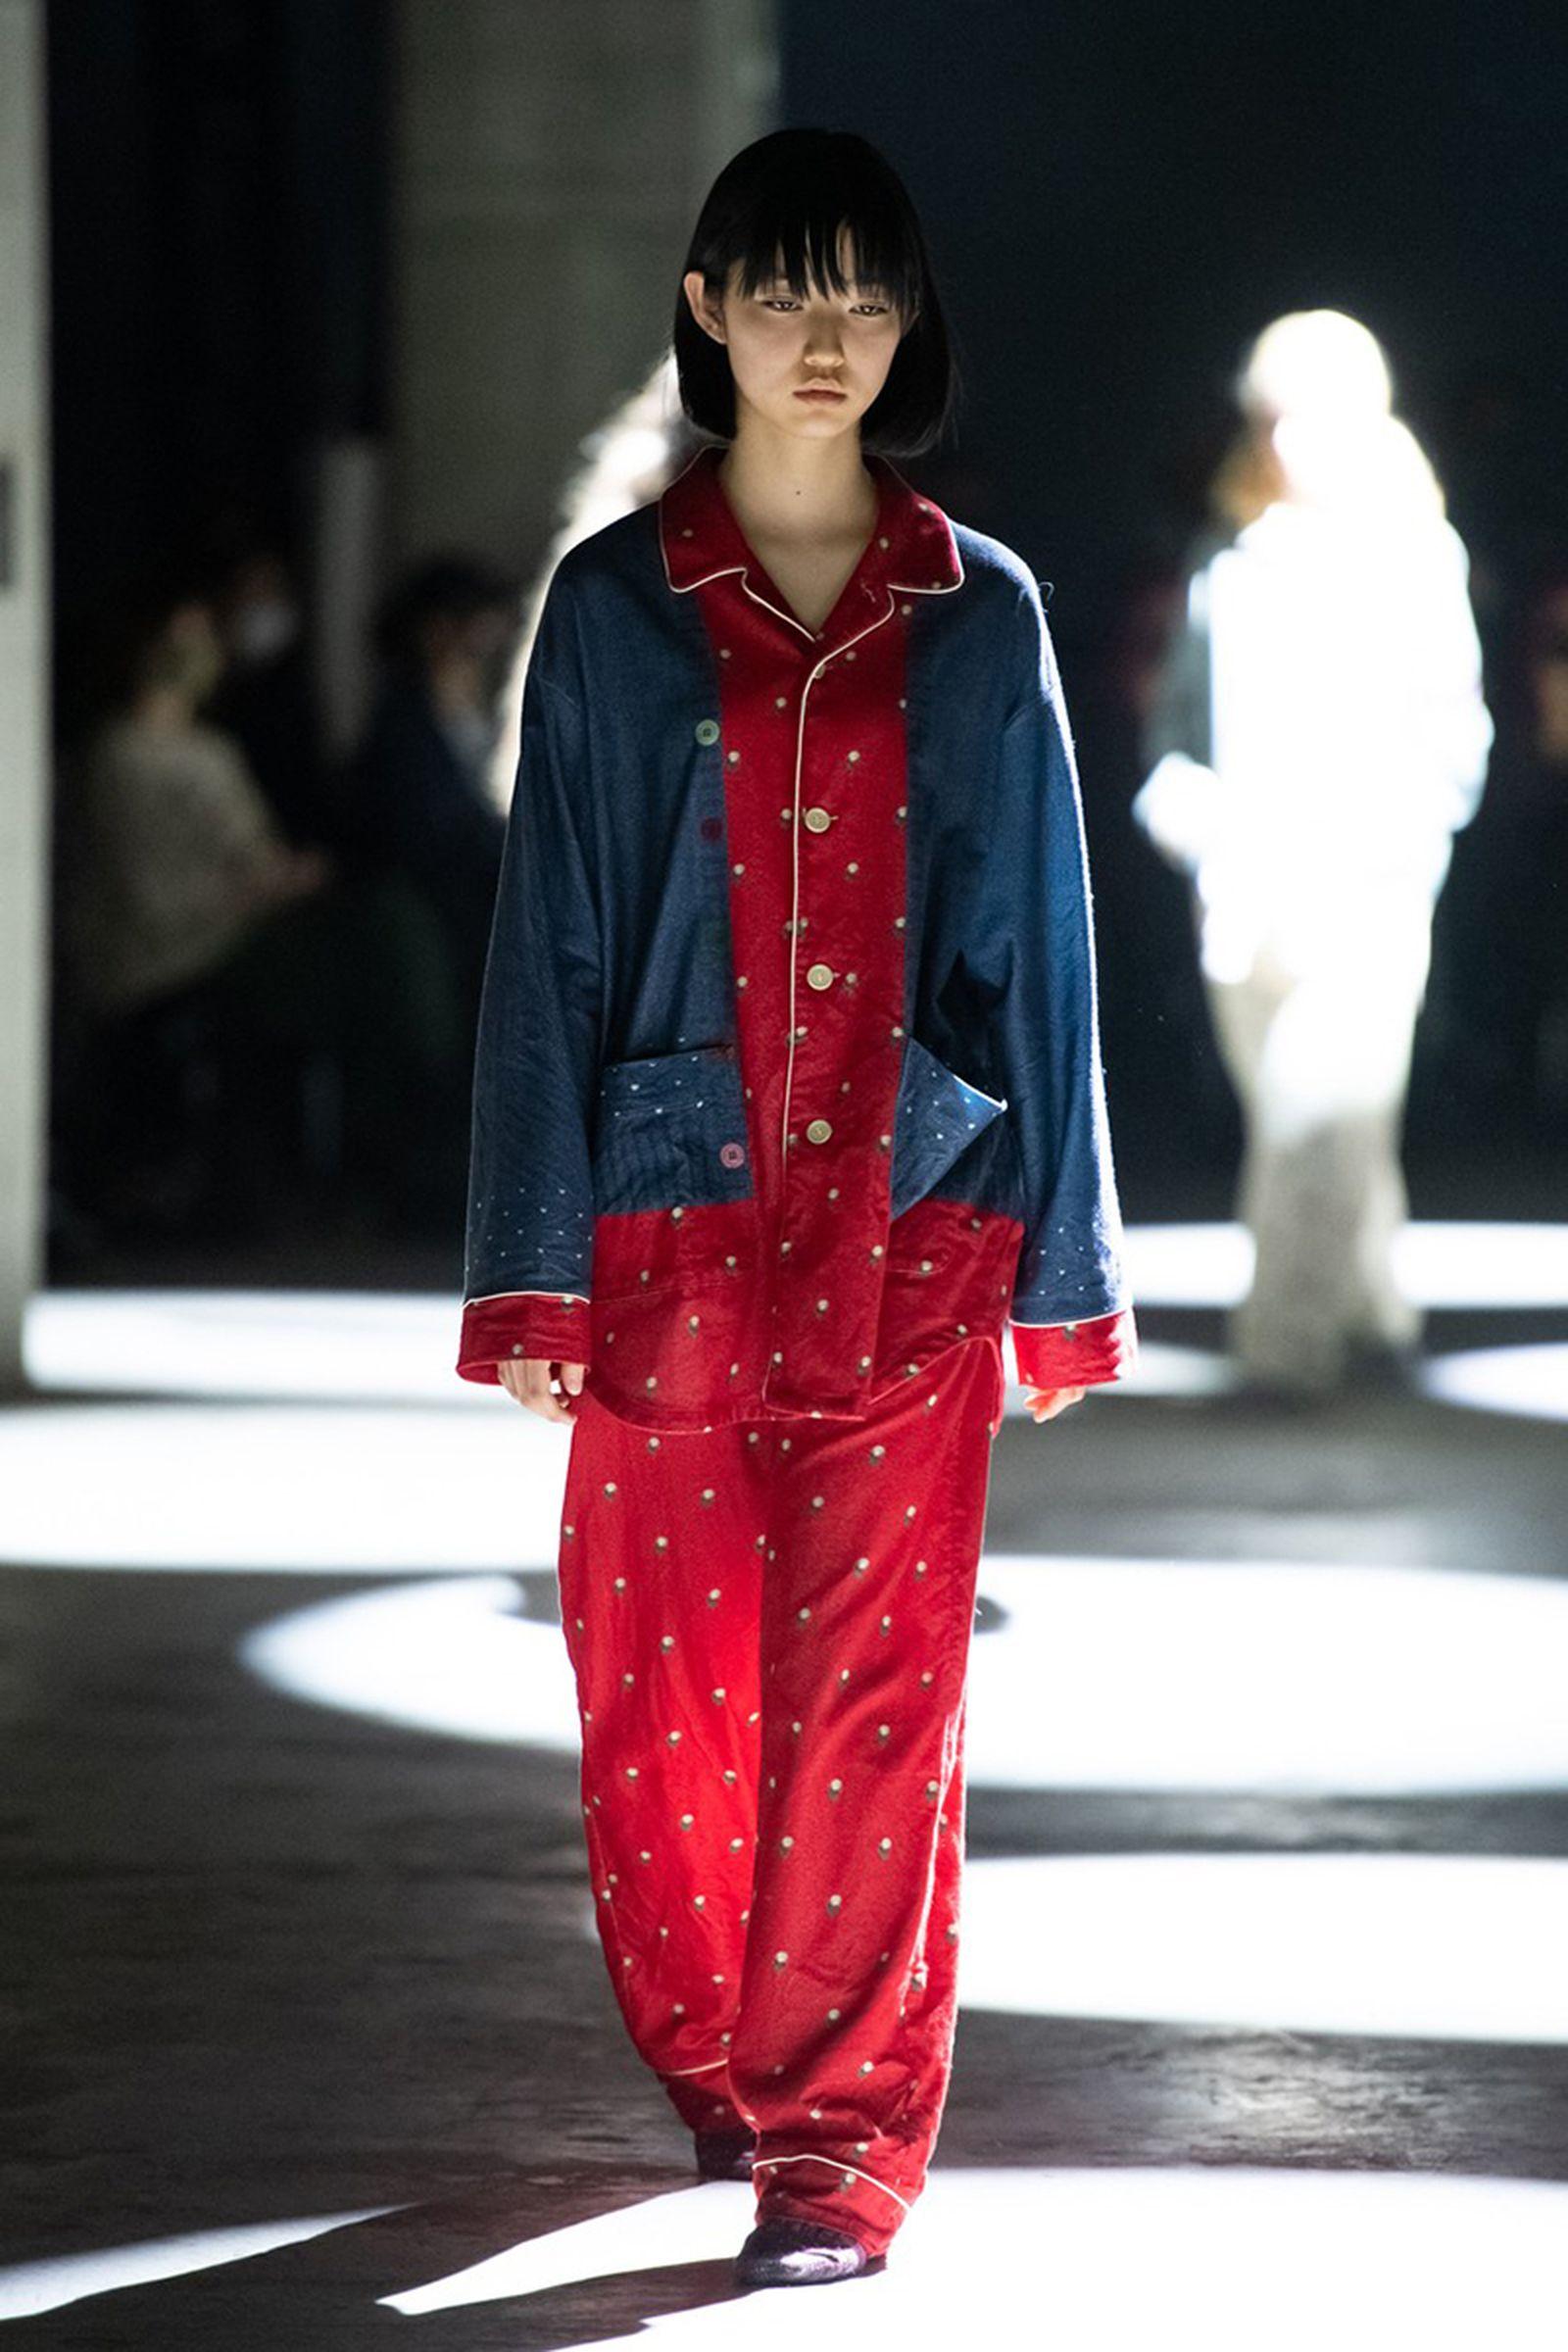 undercover-fw21-show-tokyo-fashion-week-01